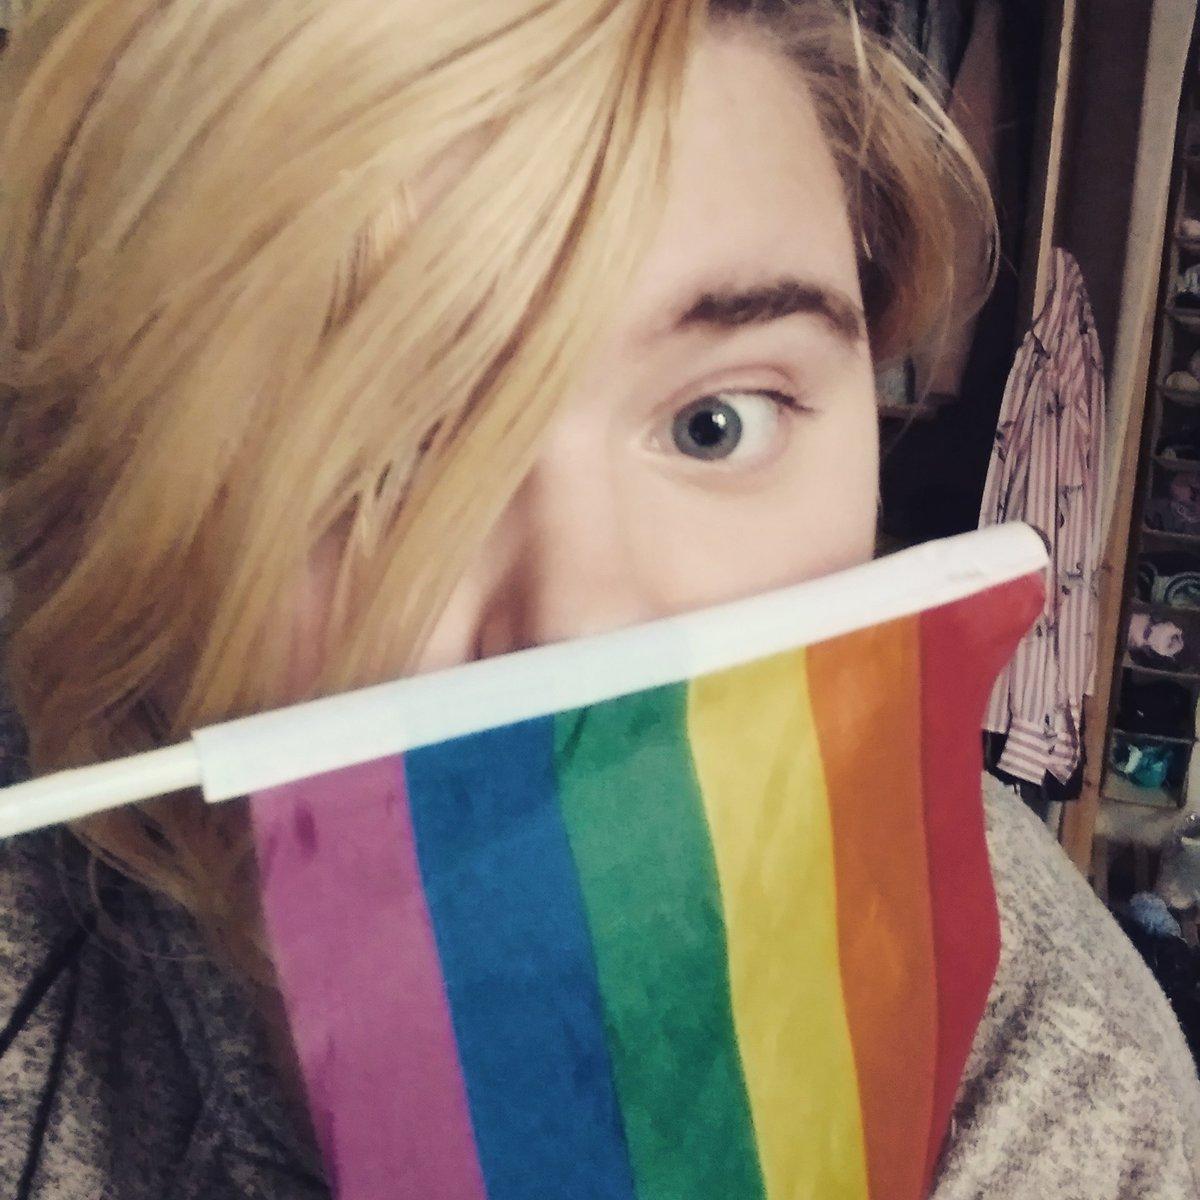 And lesbian flag